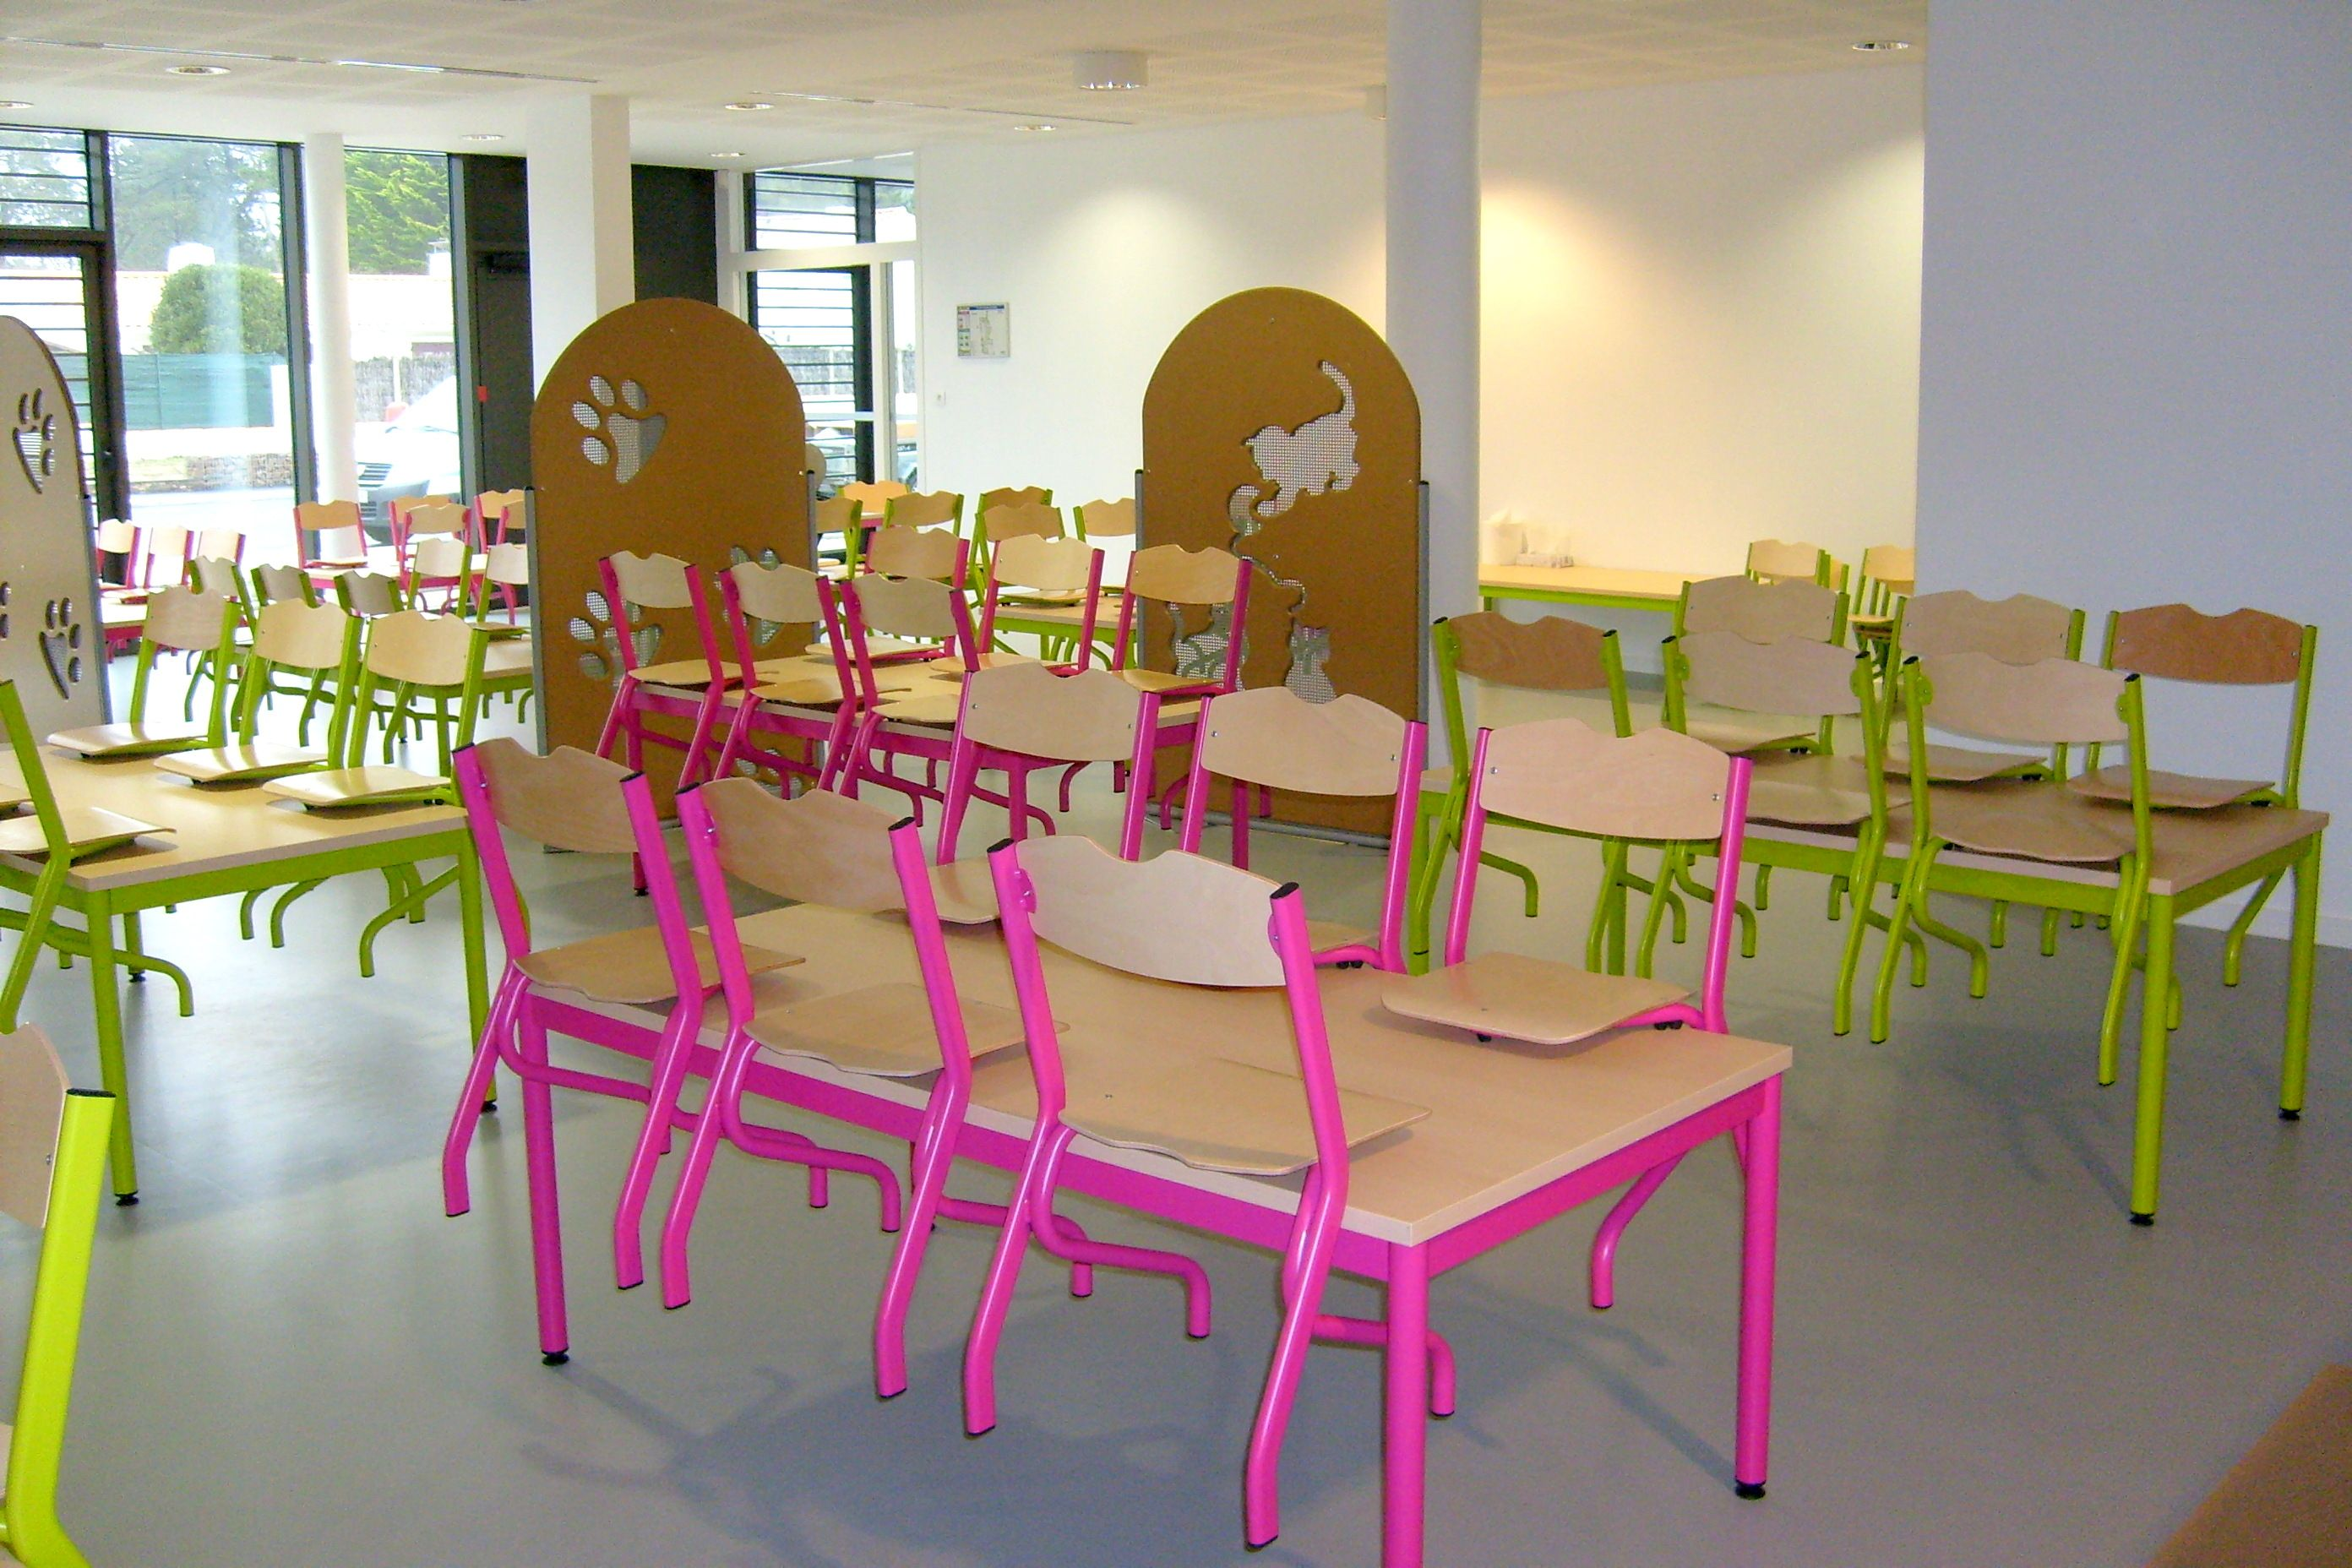 ambiance cantine scolaire maternelle chiases tim et tables comite ensembletablechaise table. Black Bedroom Furniture Sets. Home Design Ideas